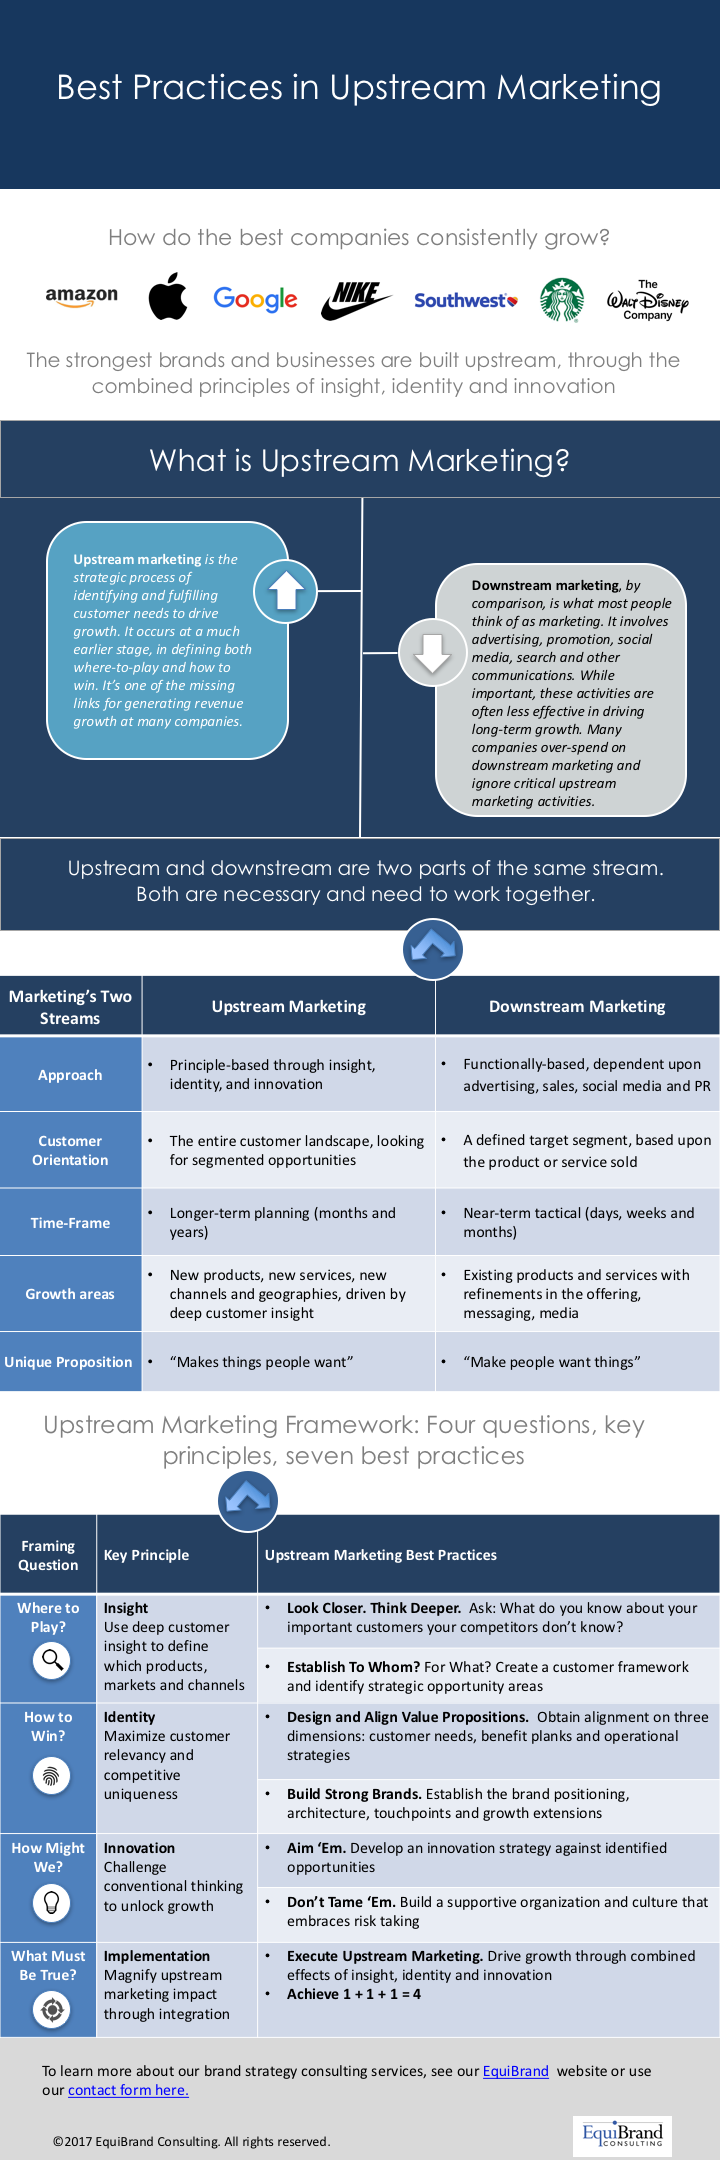 Best Practices in Upstream #Marketing #Infographic